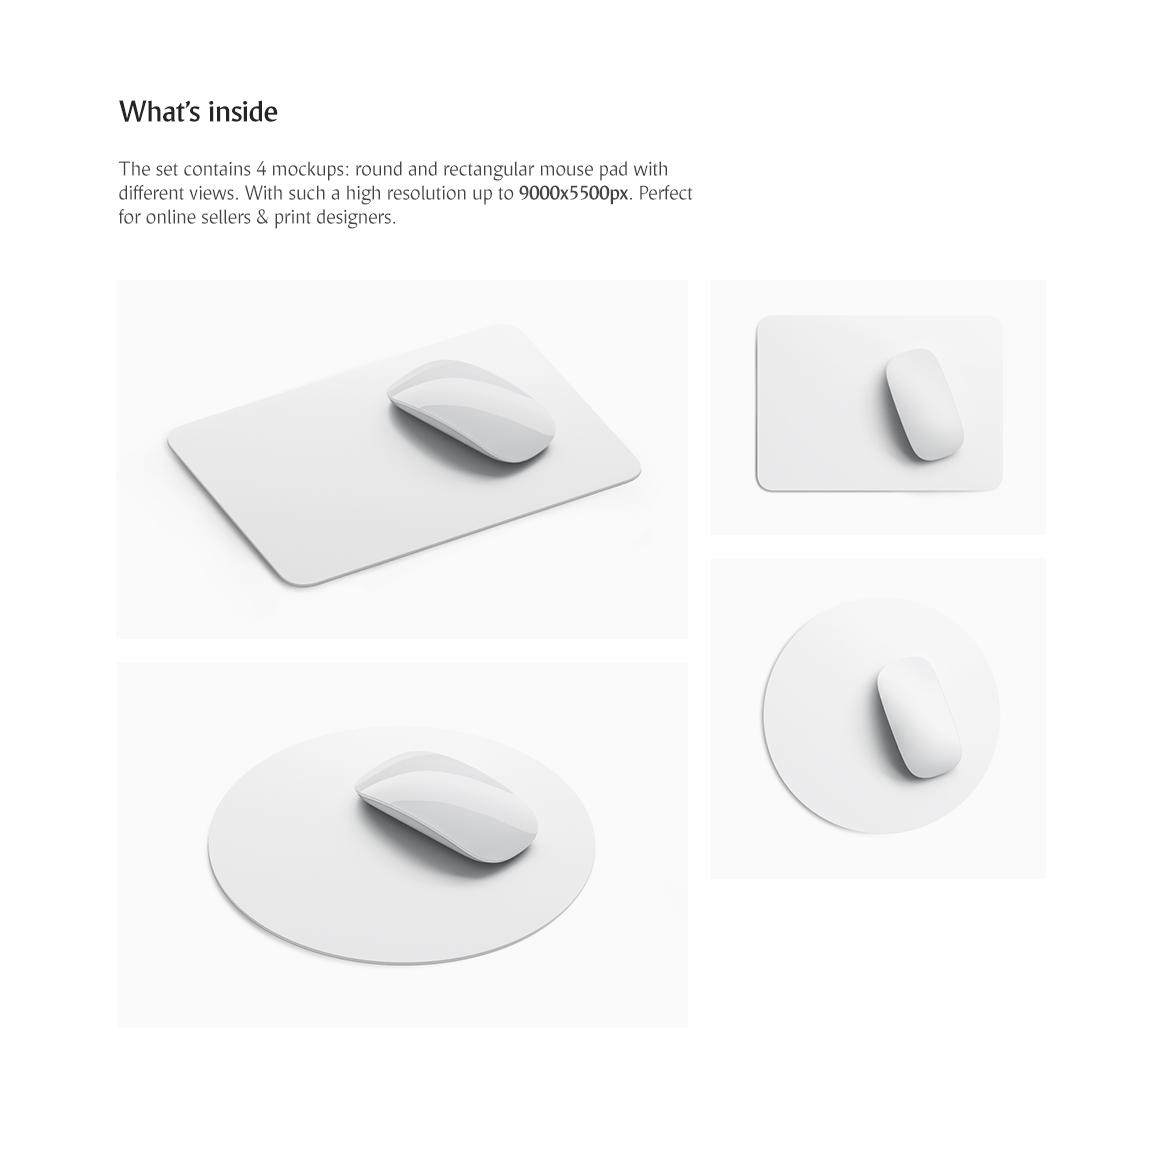 Mouse Pad Set Product Mockups